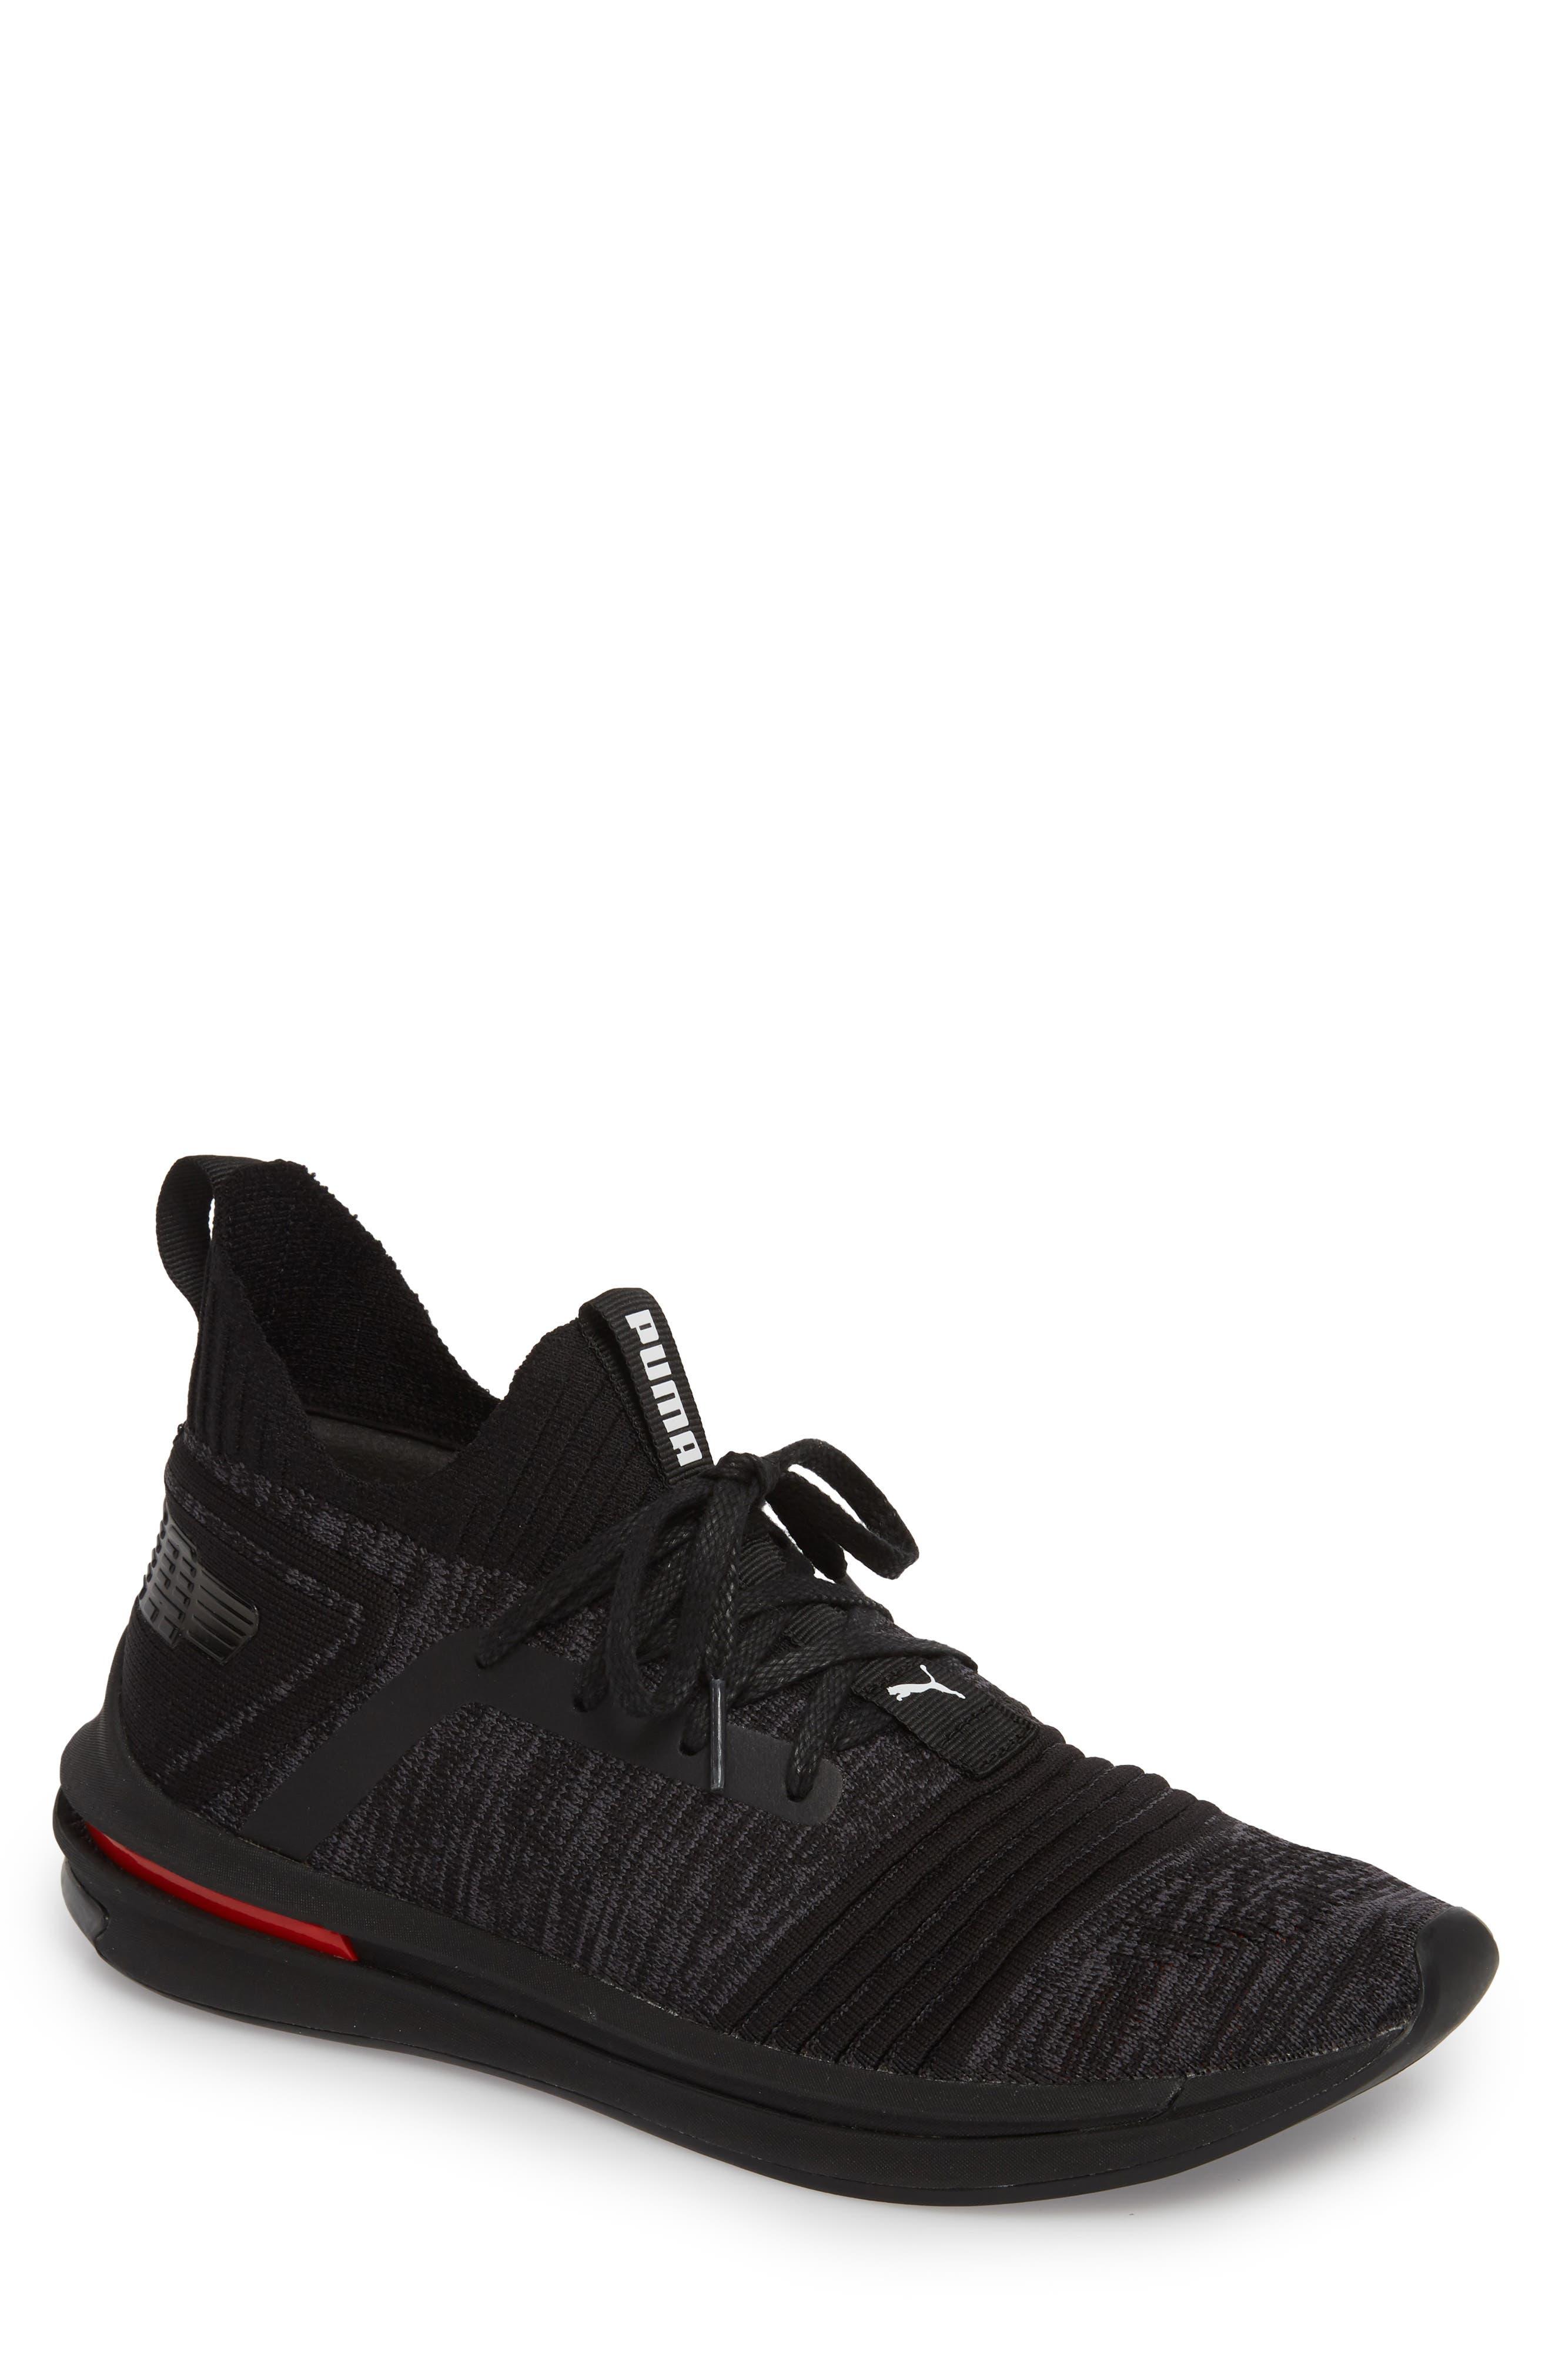 IGNITE Limitless SR evoKNIT Sneaker,                             Main thumbnail 1, color,                             001